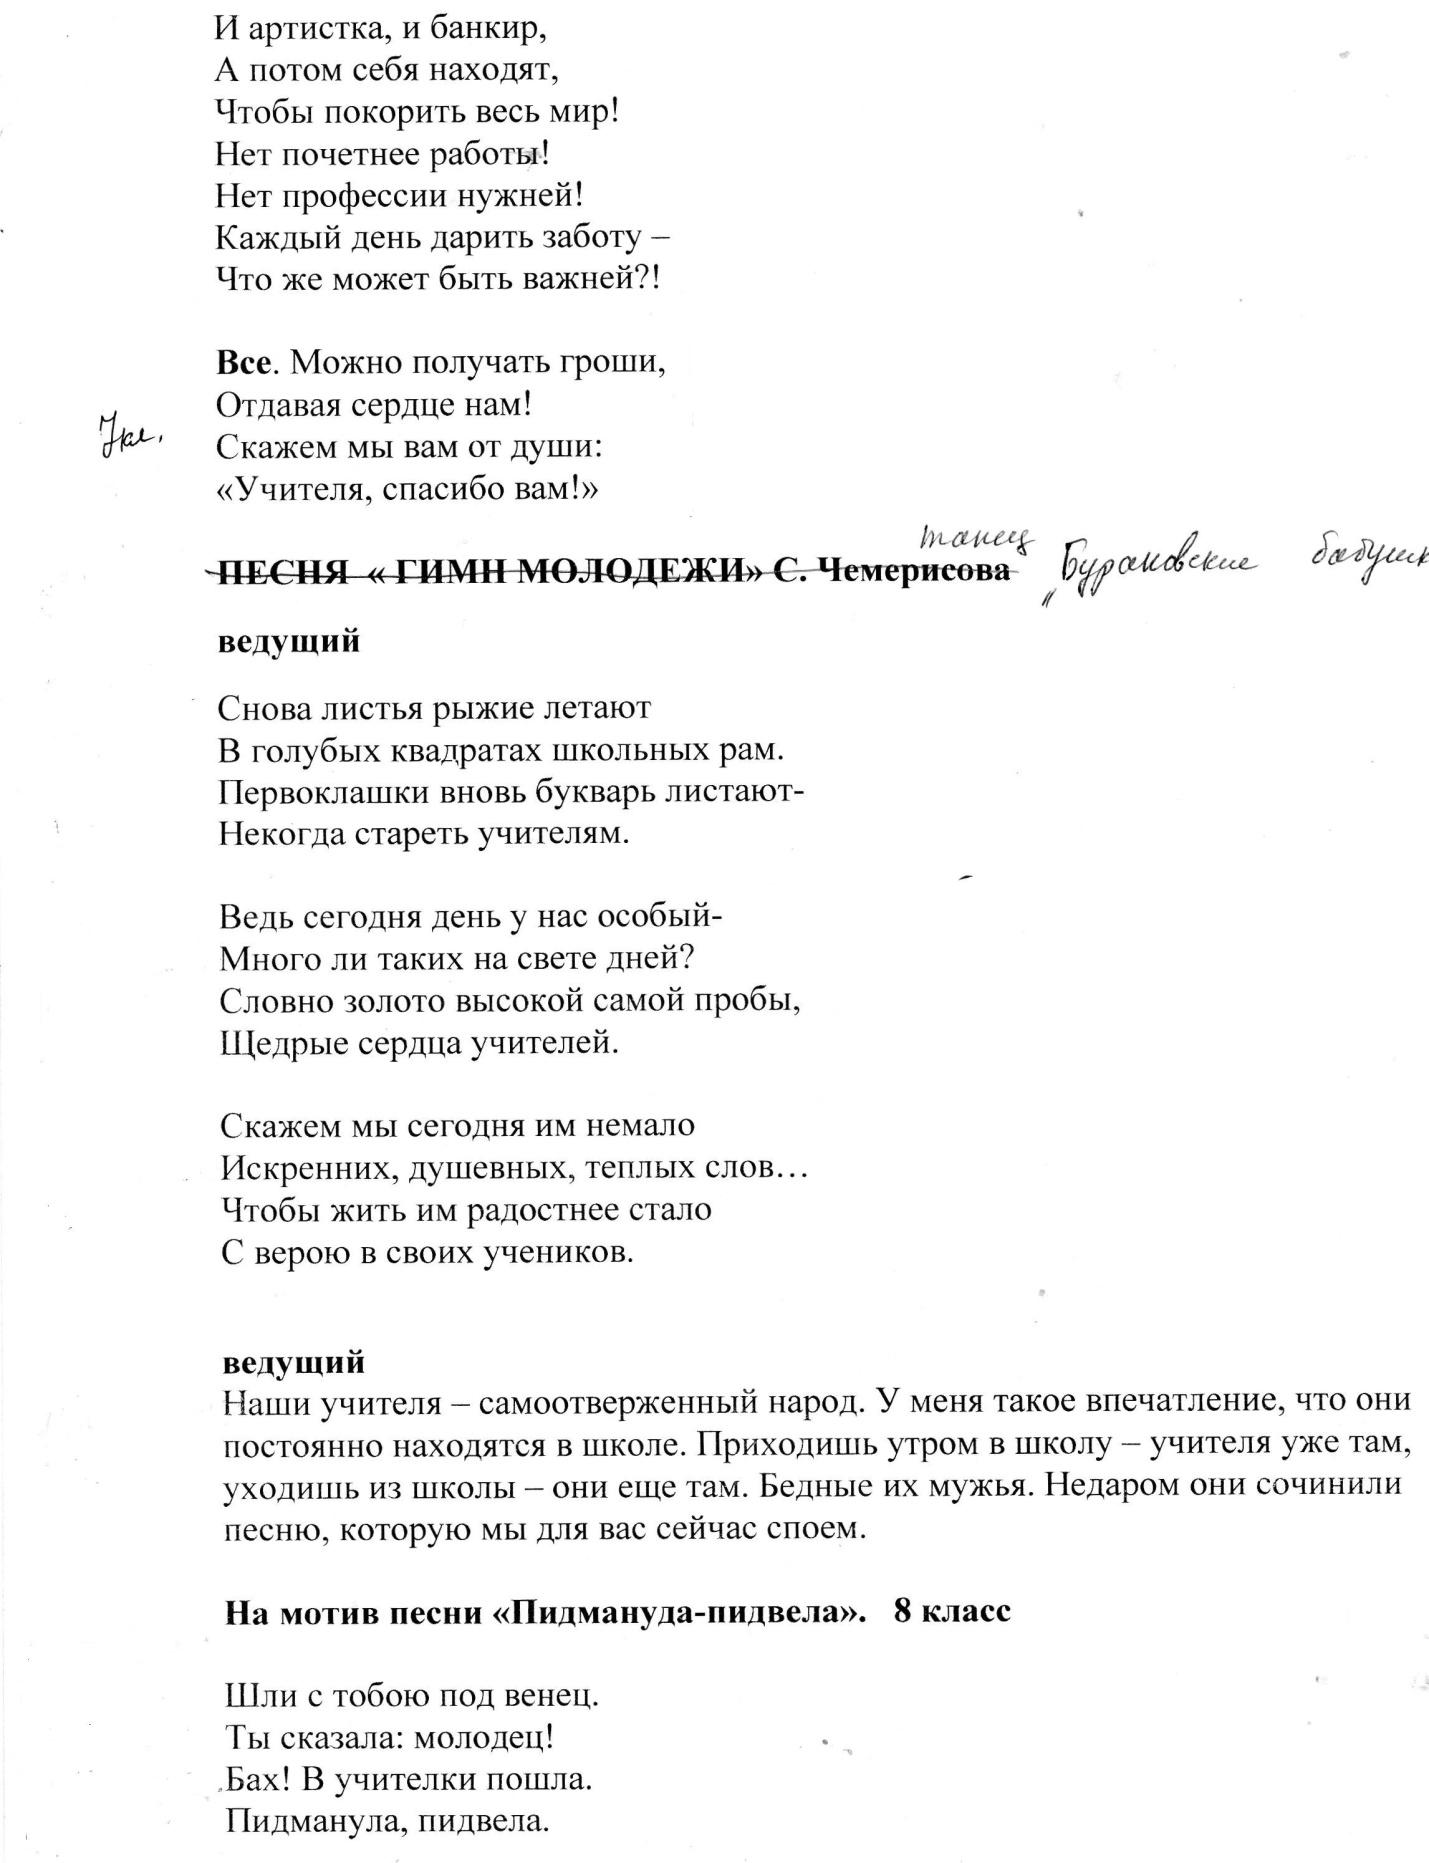 C:\Documents and Settings\ADMIN\Мои документы\Мои рисунки\день учителя\img034.jpg